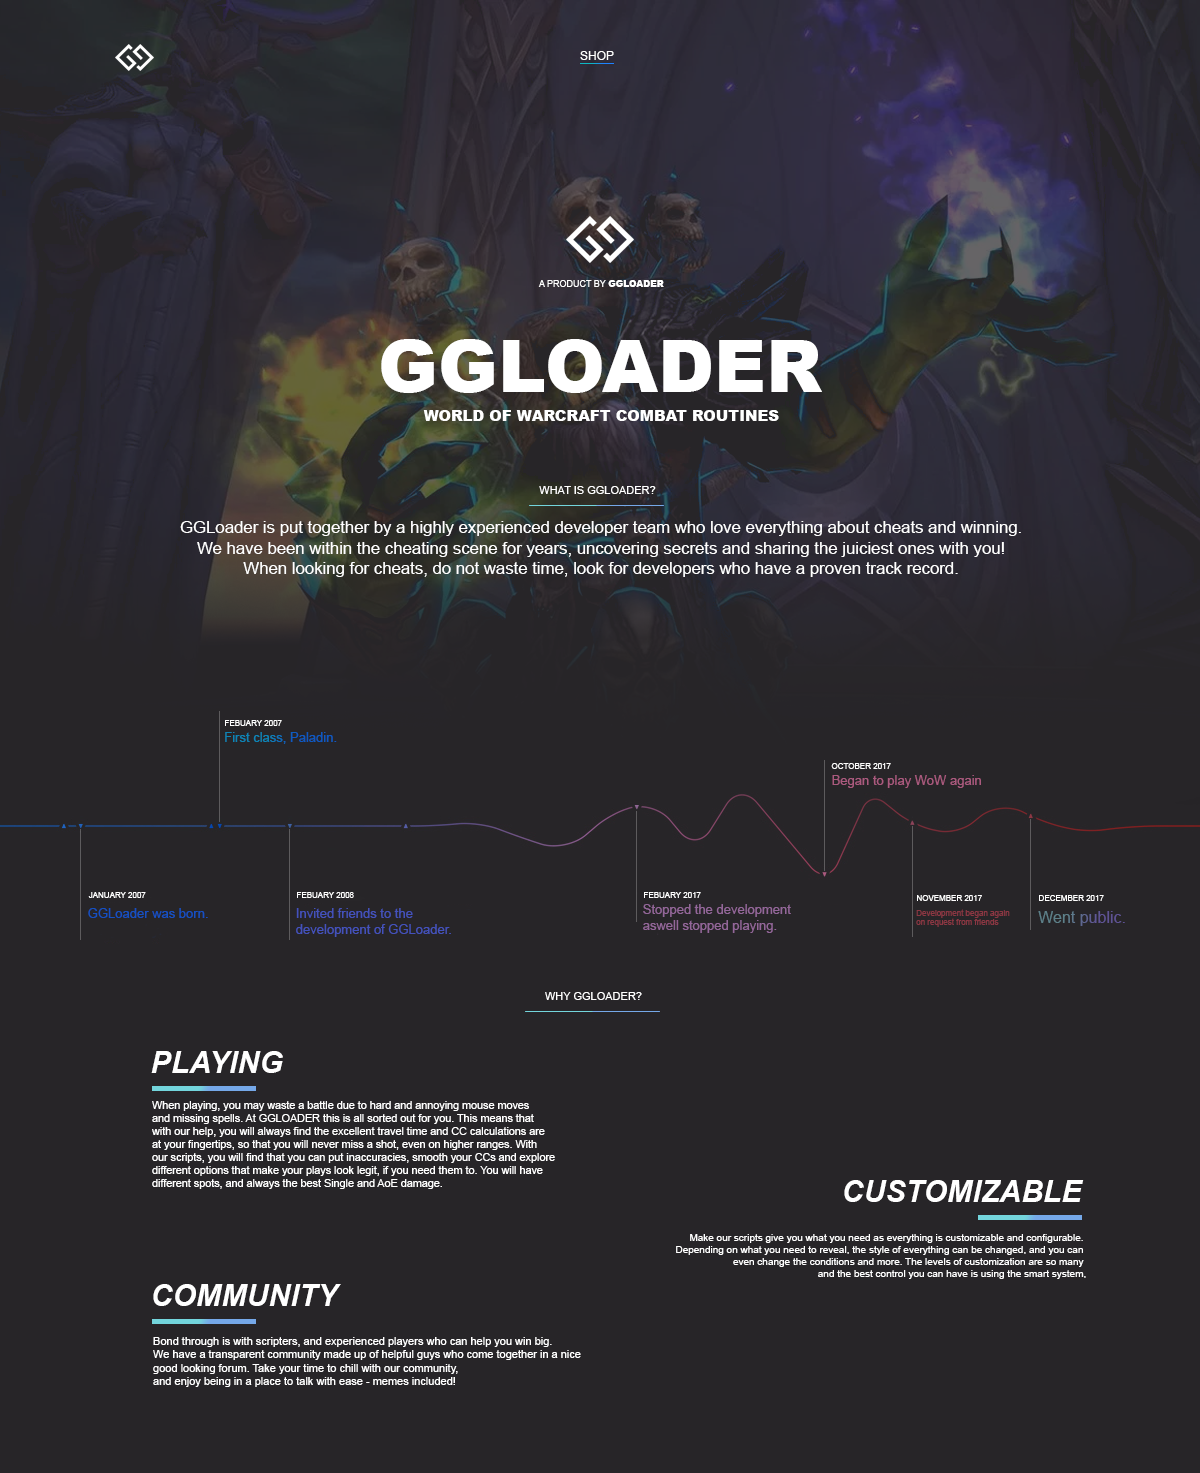 B] - GGLoader 8 1 5 PRO PvP+PvE PIXEL ⚔️COMBAT ROUTINES⚔️ ARENA